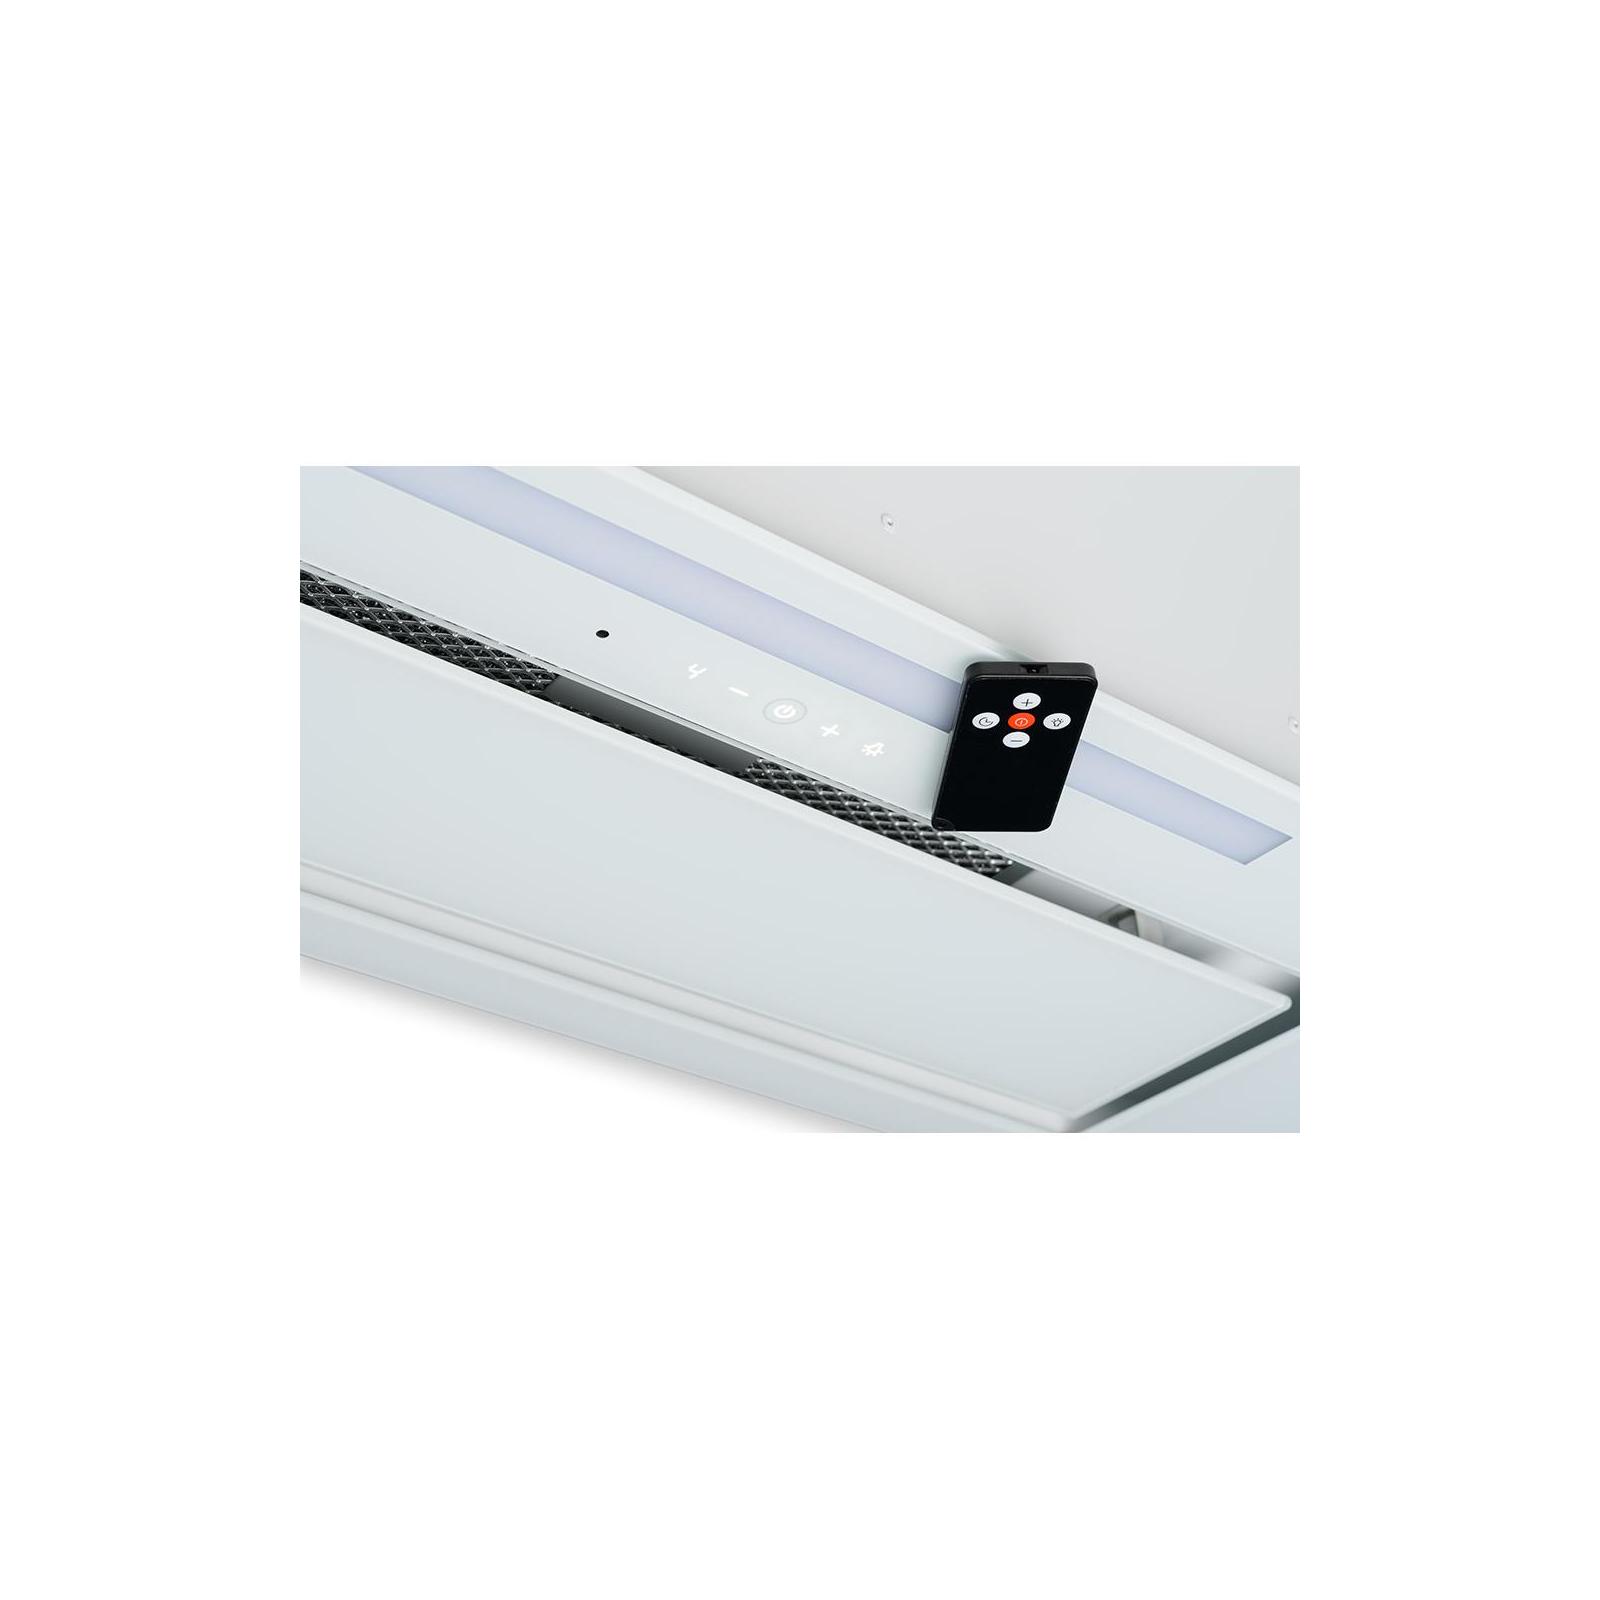 Вытяжка кухонная PERFELLI BISP 9973 A 1250 W LED Strip изображение 4